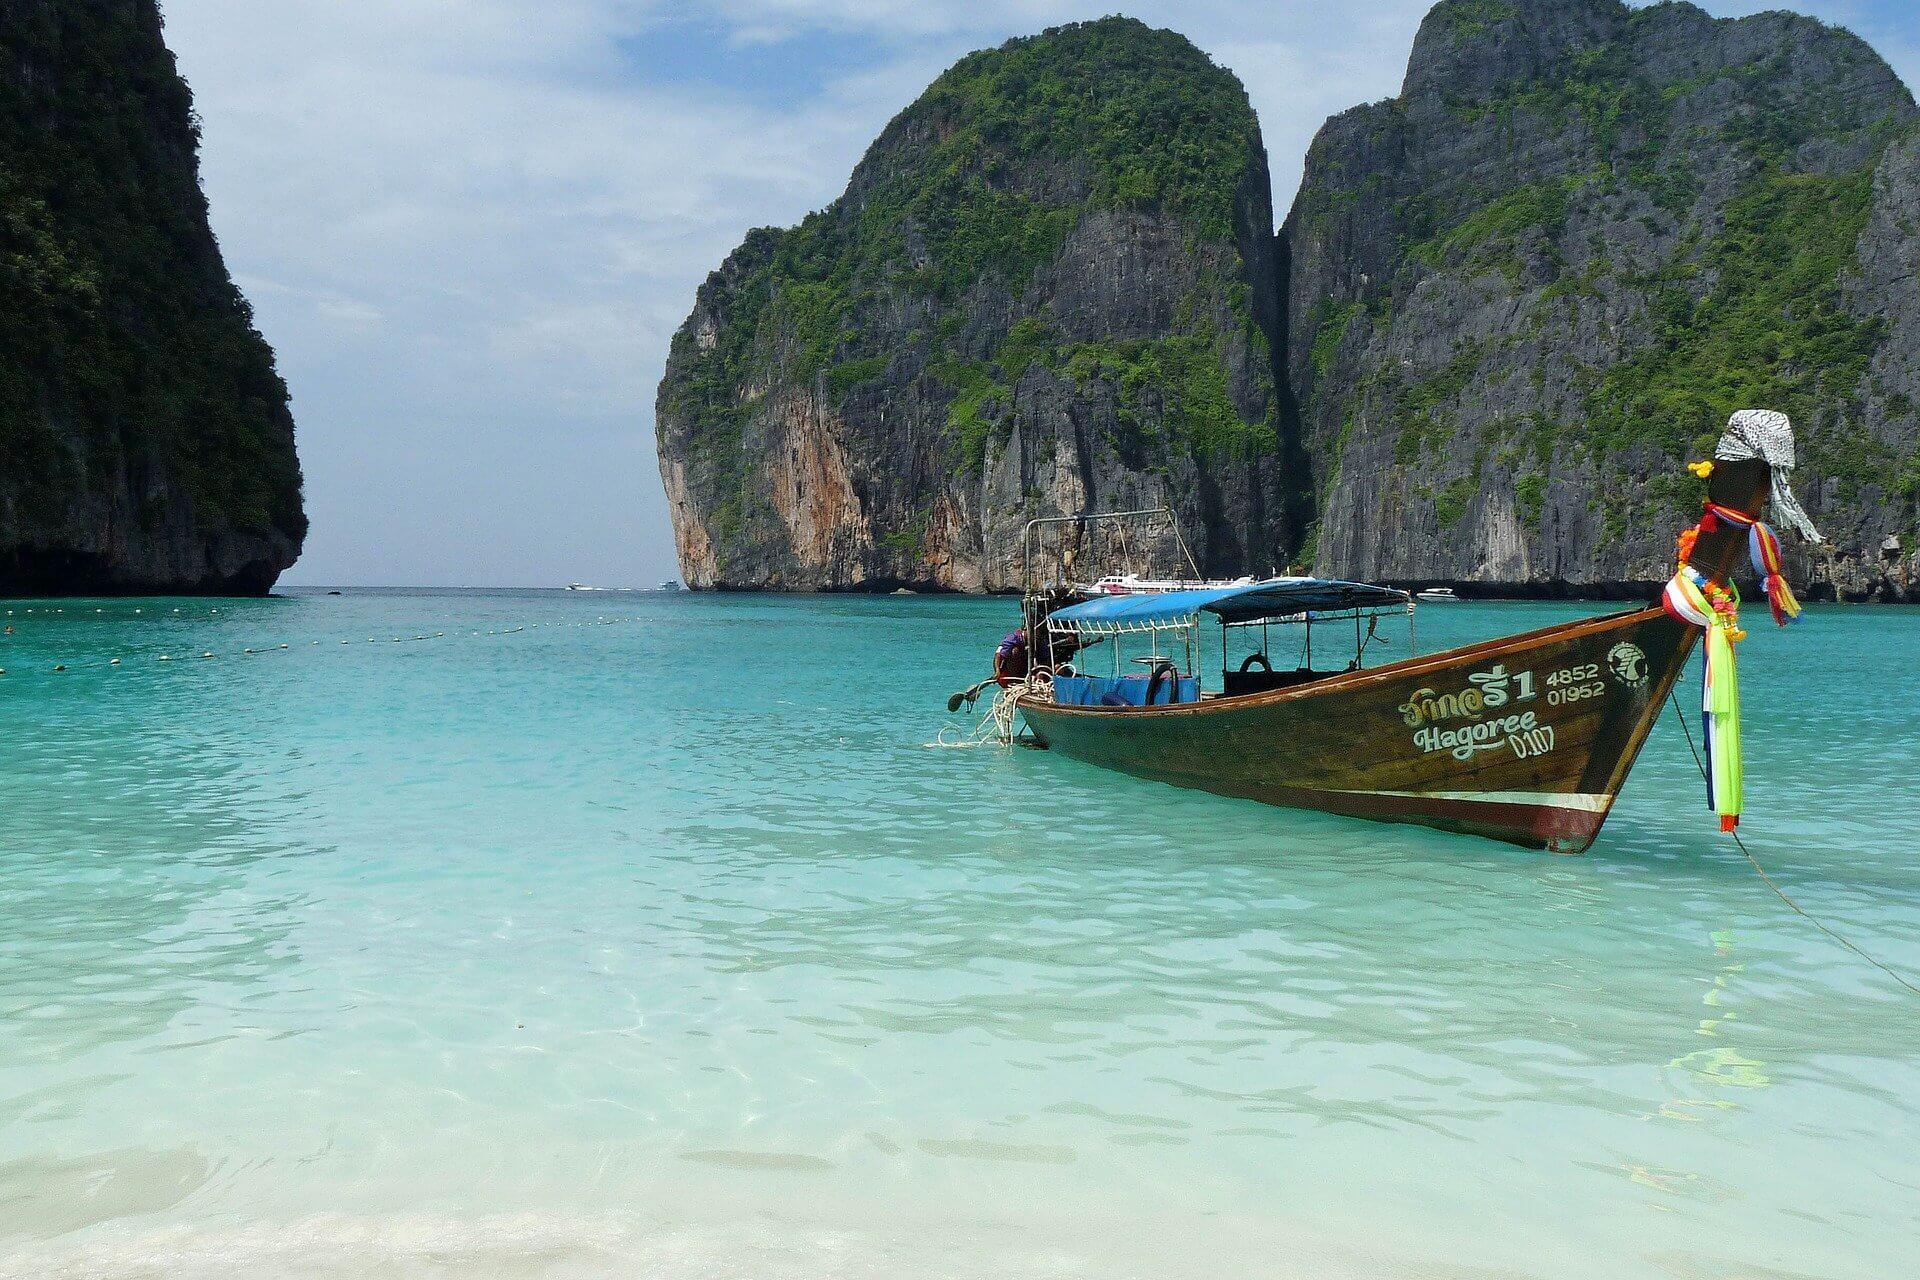 Phuket to Phi Phi ferry cost